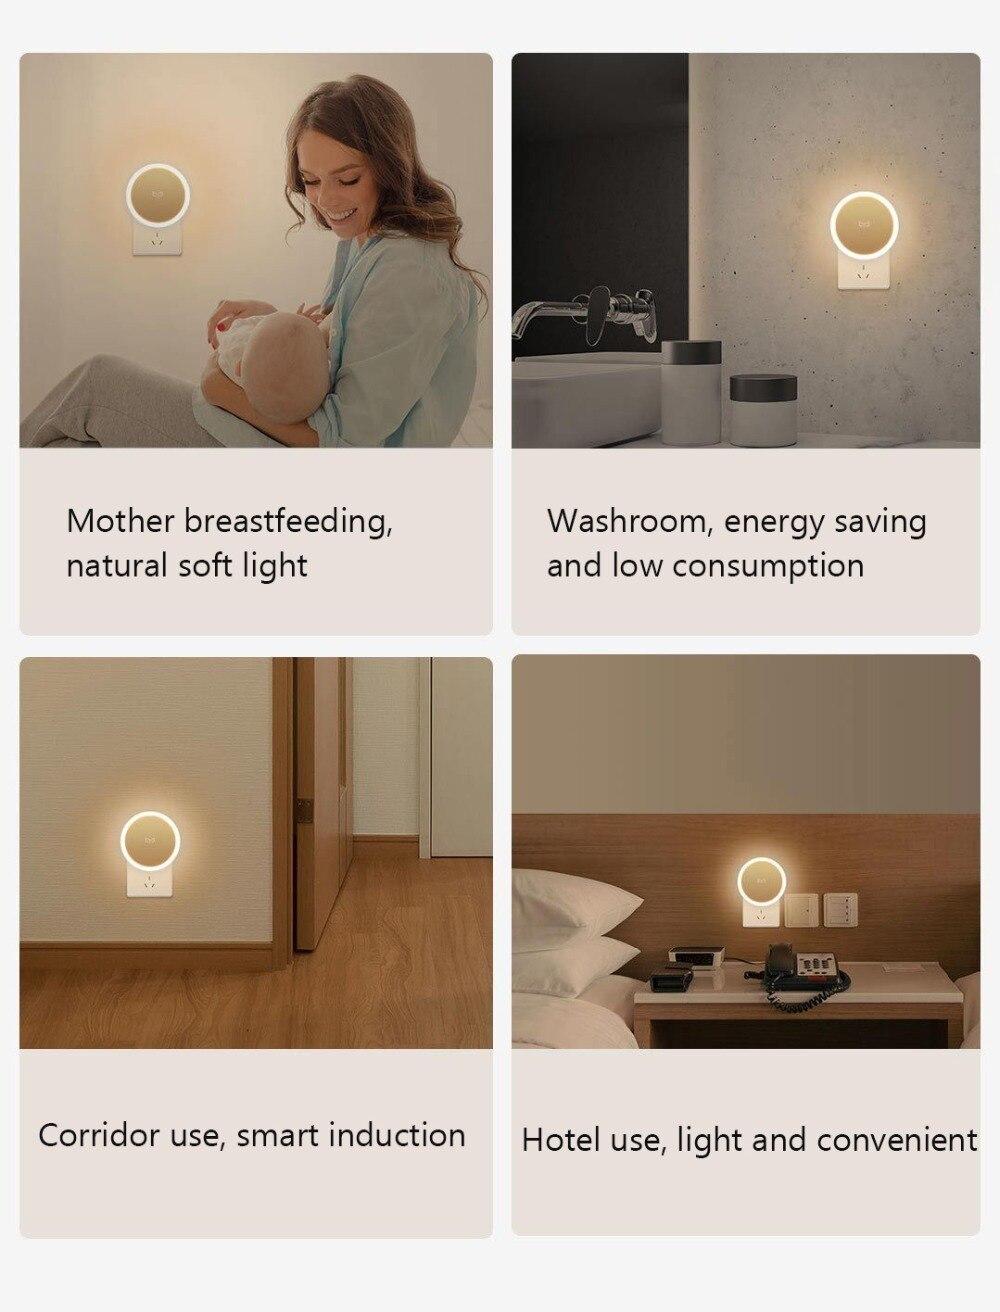 Bundled Sale Xiaomi mijia Yeelight induction night light (plug-in version) YLYD03YL led lamp bed lights for bedroom corridor Wal (9)